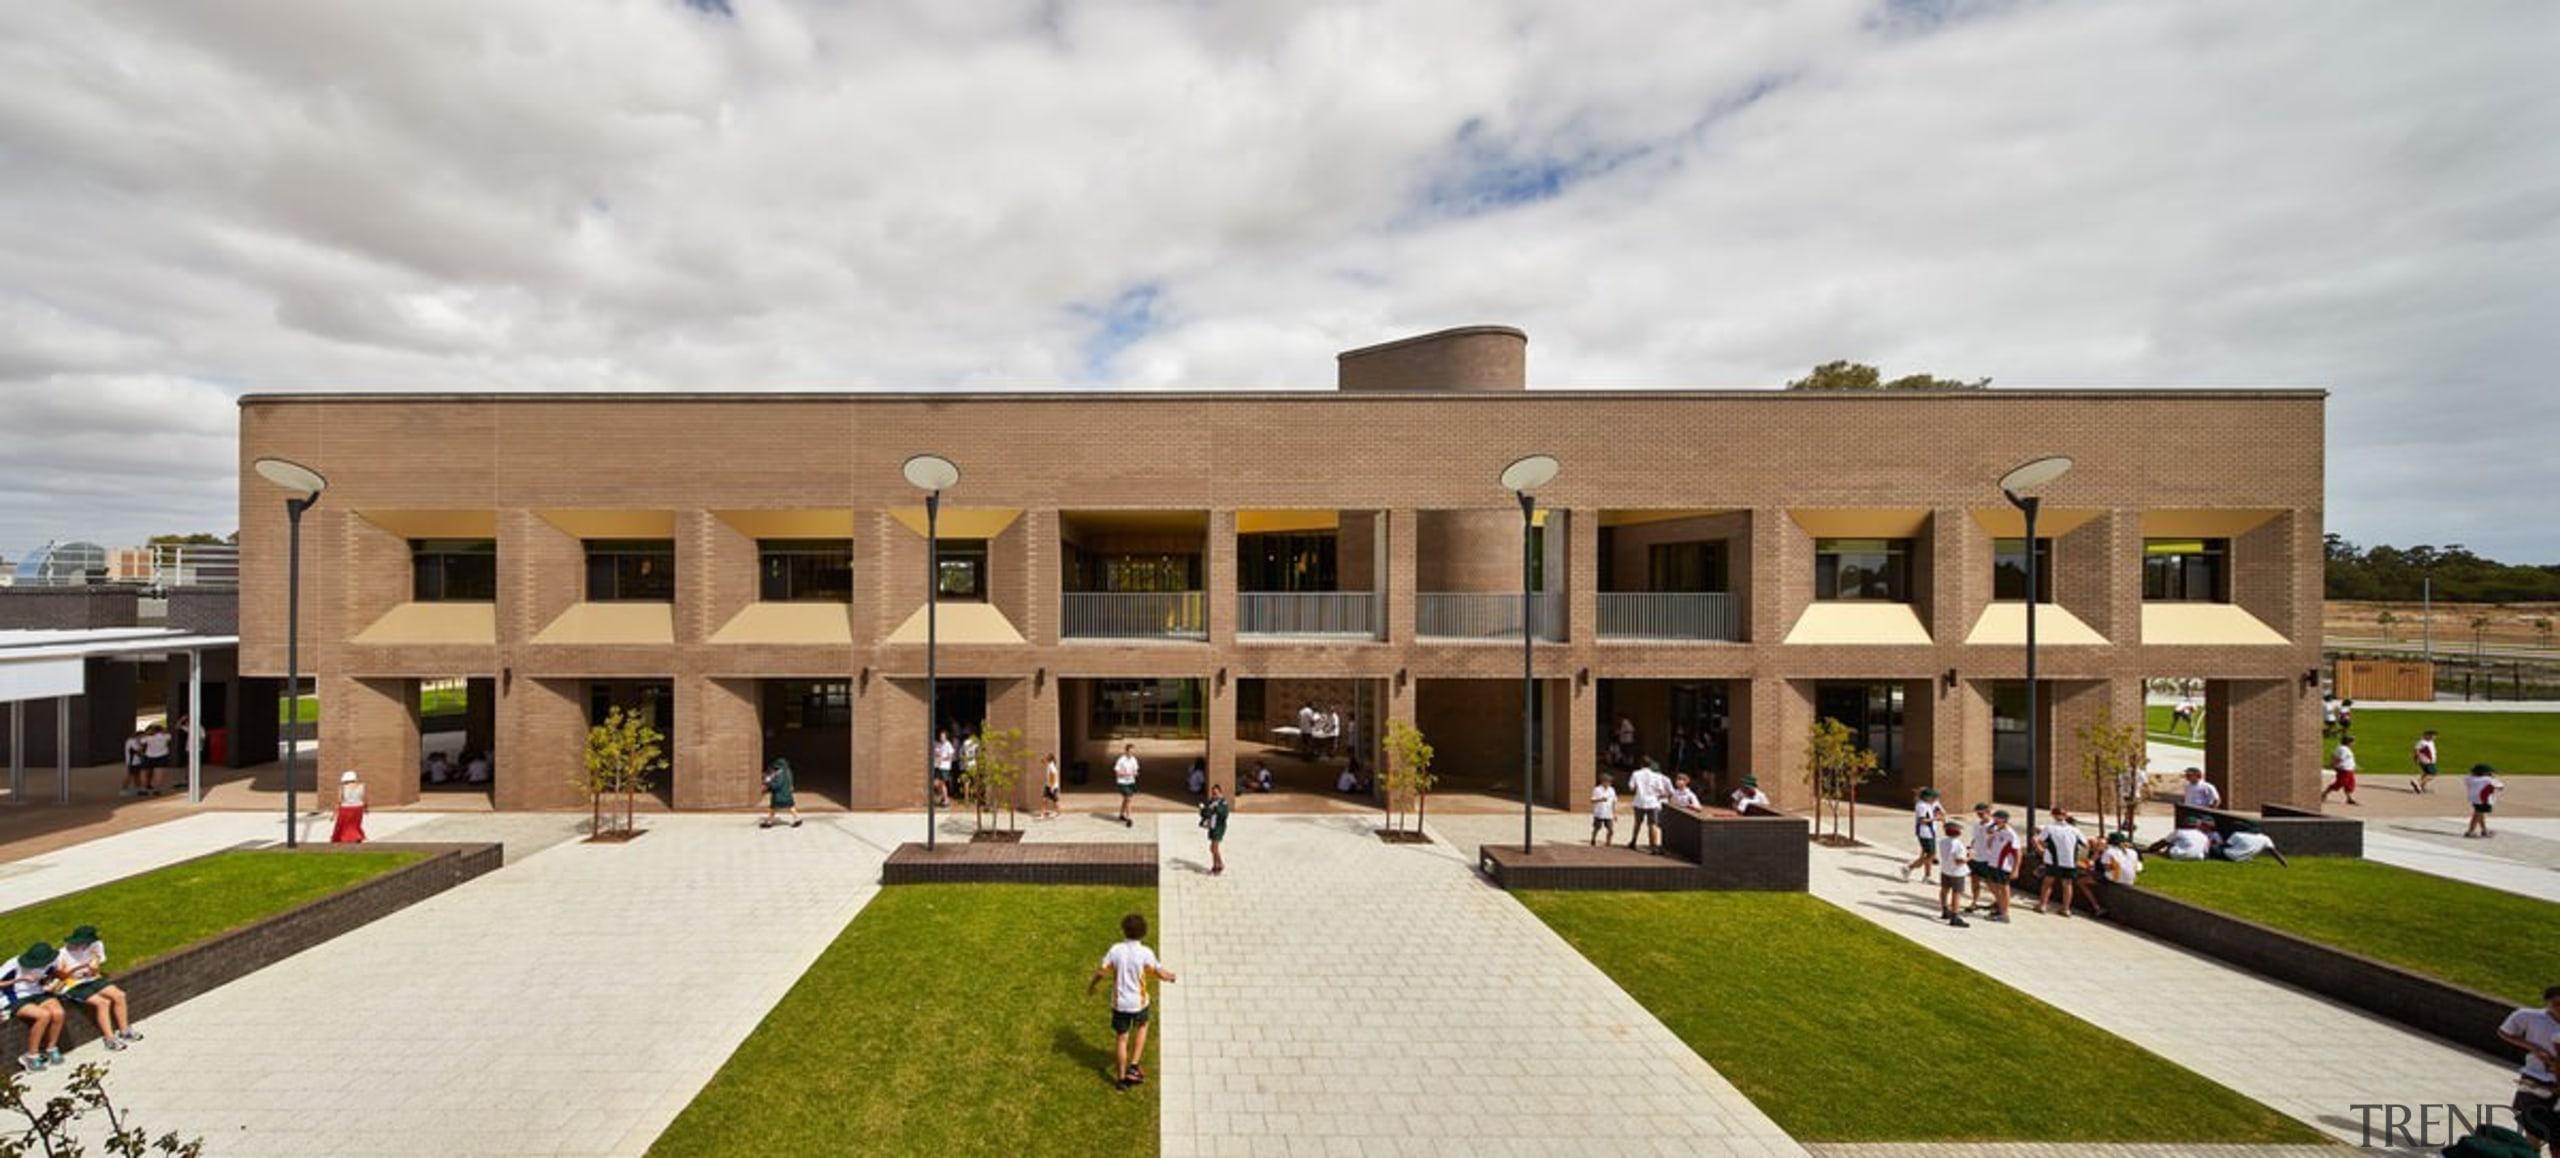 Bunbury Catholic College – Mercy Campus - Bunbury building, campus, estate, house, mansion, official residence, property, real estate, white, brown